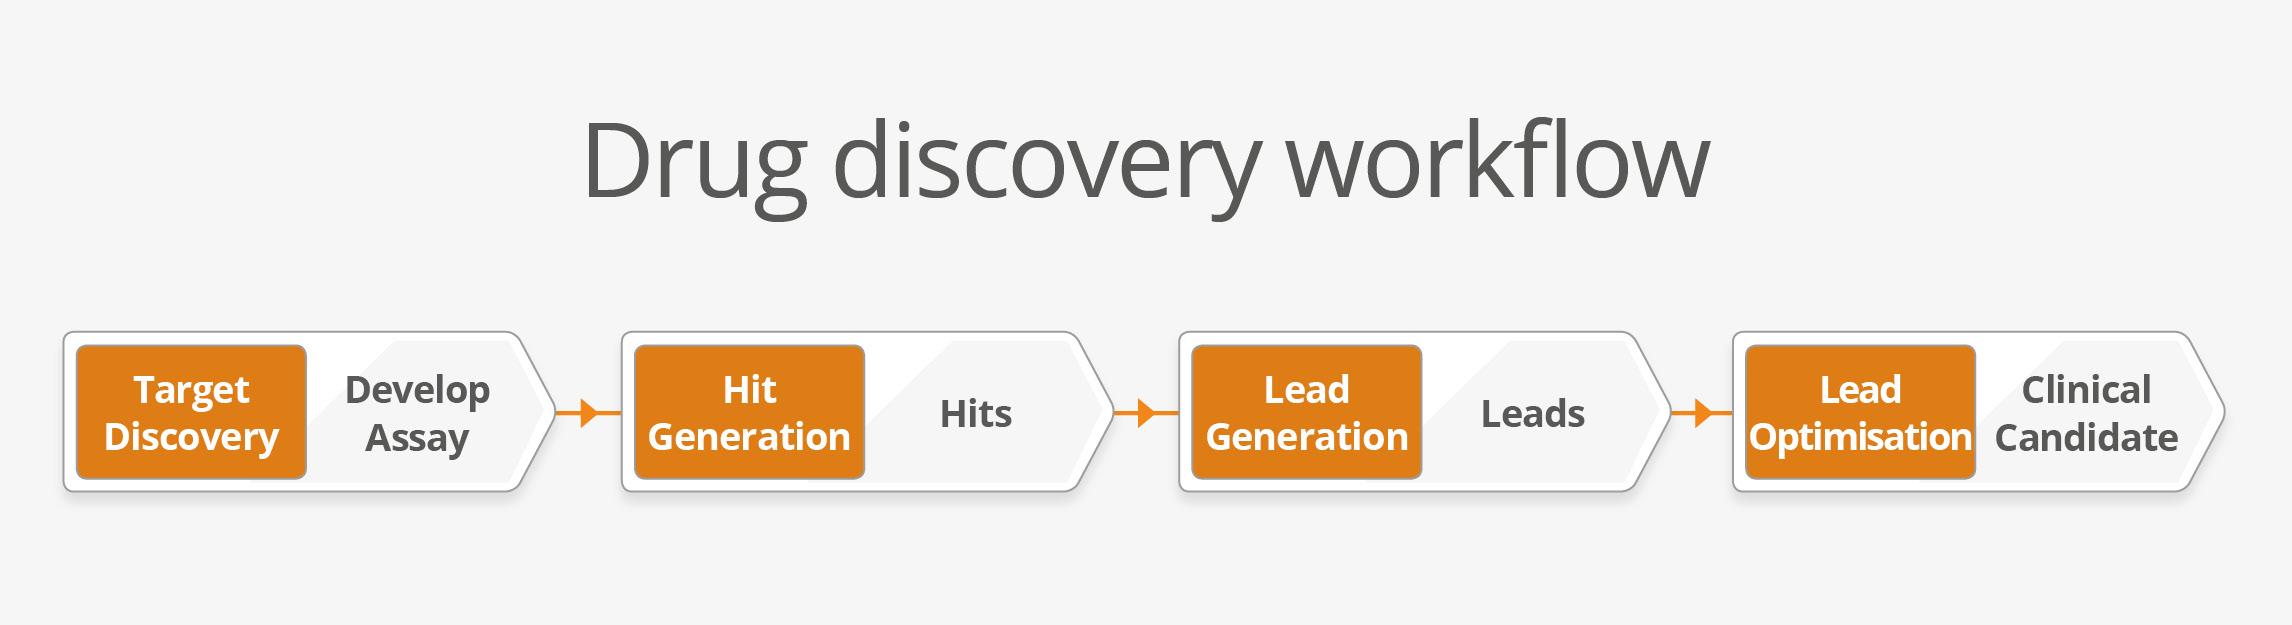 tsl157_drug-discovery-workflow_v3